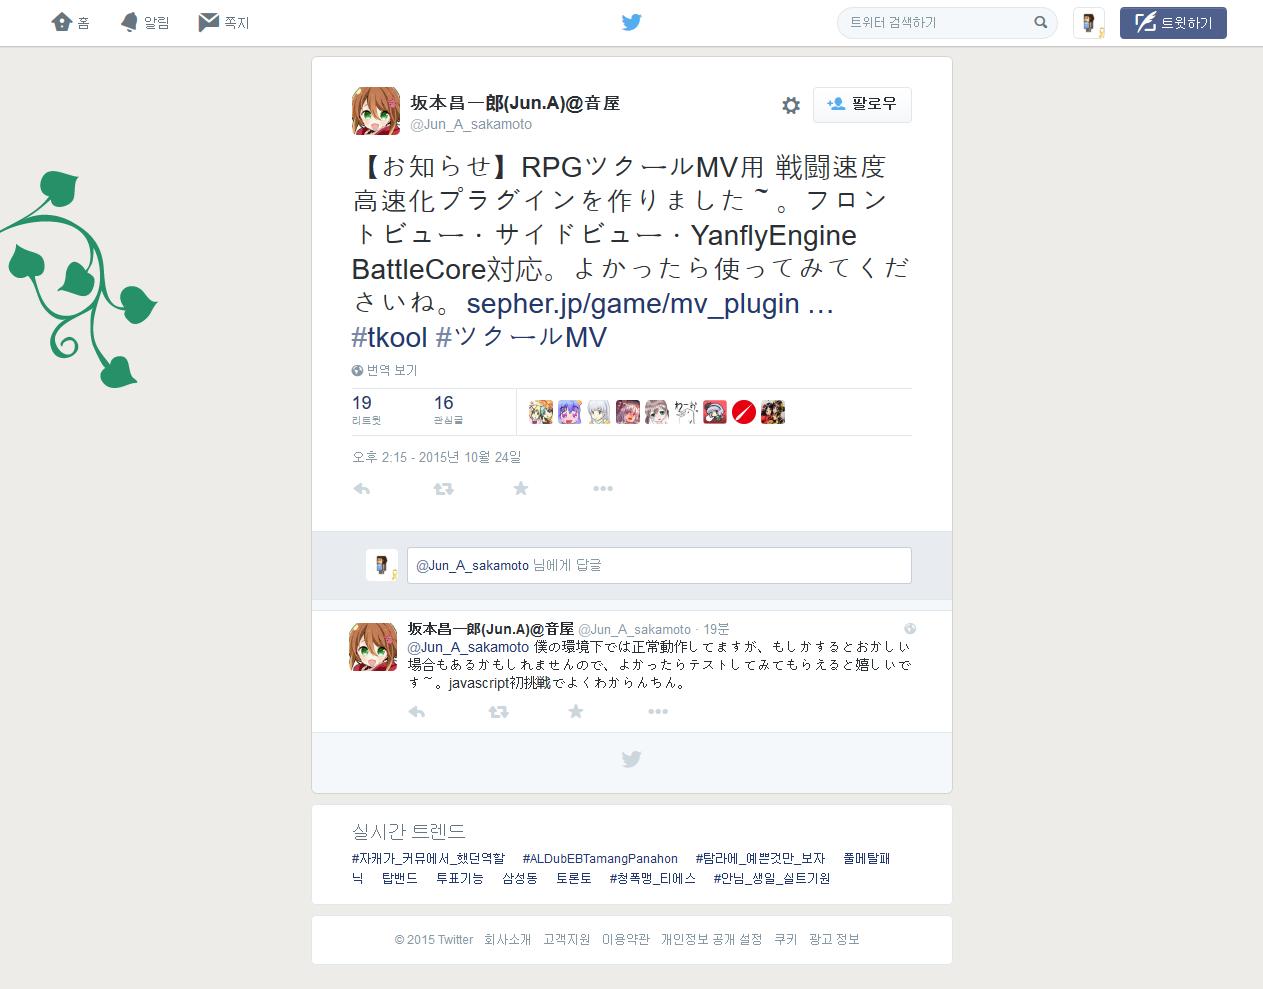 Cap 2015-10-24 14-36-50-트위터의 坂本昌一郎(Jun.A)@音屋 님- 【お知らせ】RPGツクールMV用 戦闘速度高速化プラグインを作りました~。フロントビュー・サイドビュー・YanflyEngine BattleCore対応。よかったら使ってみてくださいね。https---t.co-AMx23JPjrP #tkool #ツクールMV.png